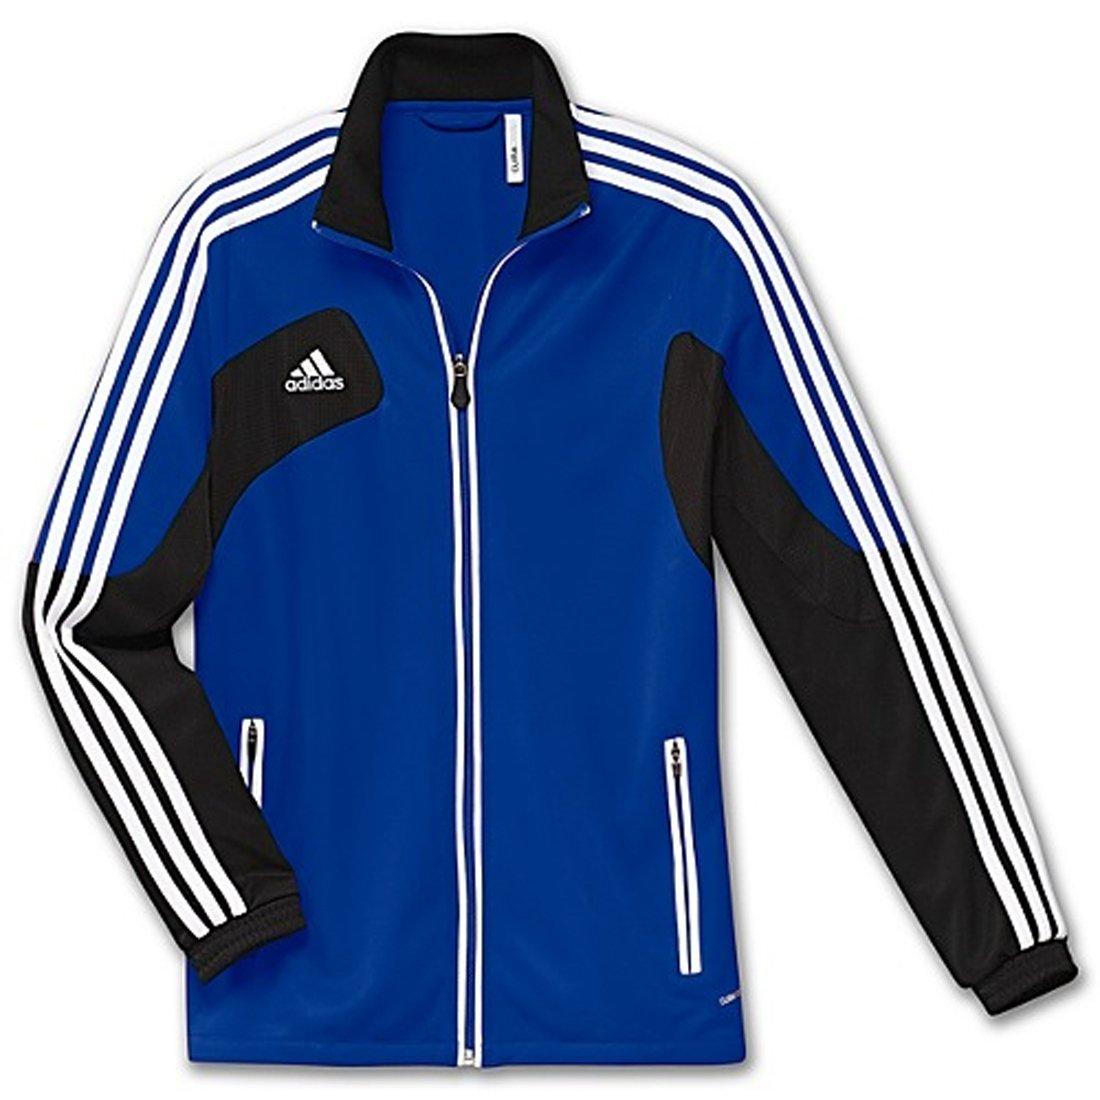 adidas New Boys' Condivo 12 Youth Soccer Training Jacket